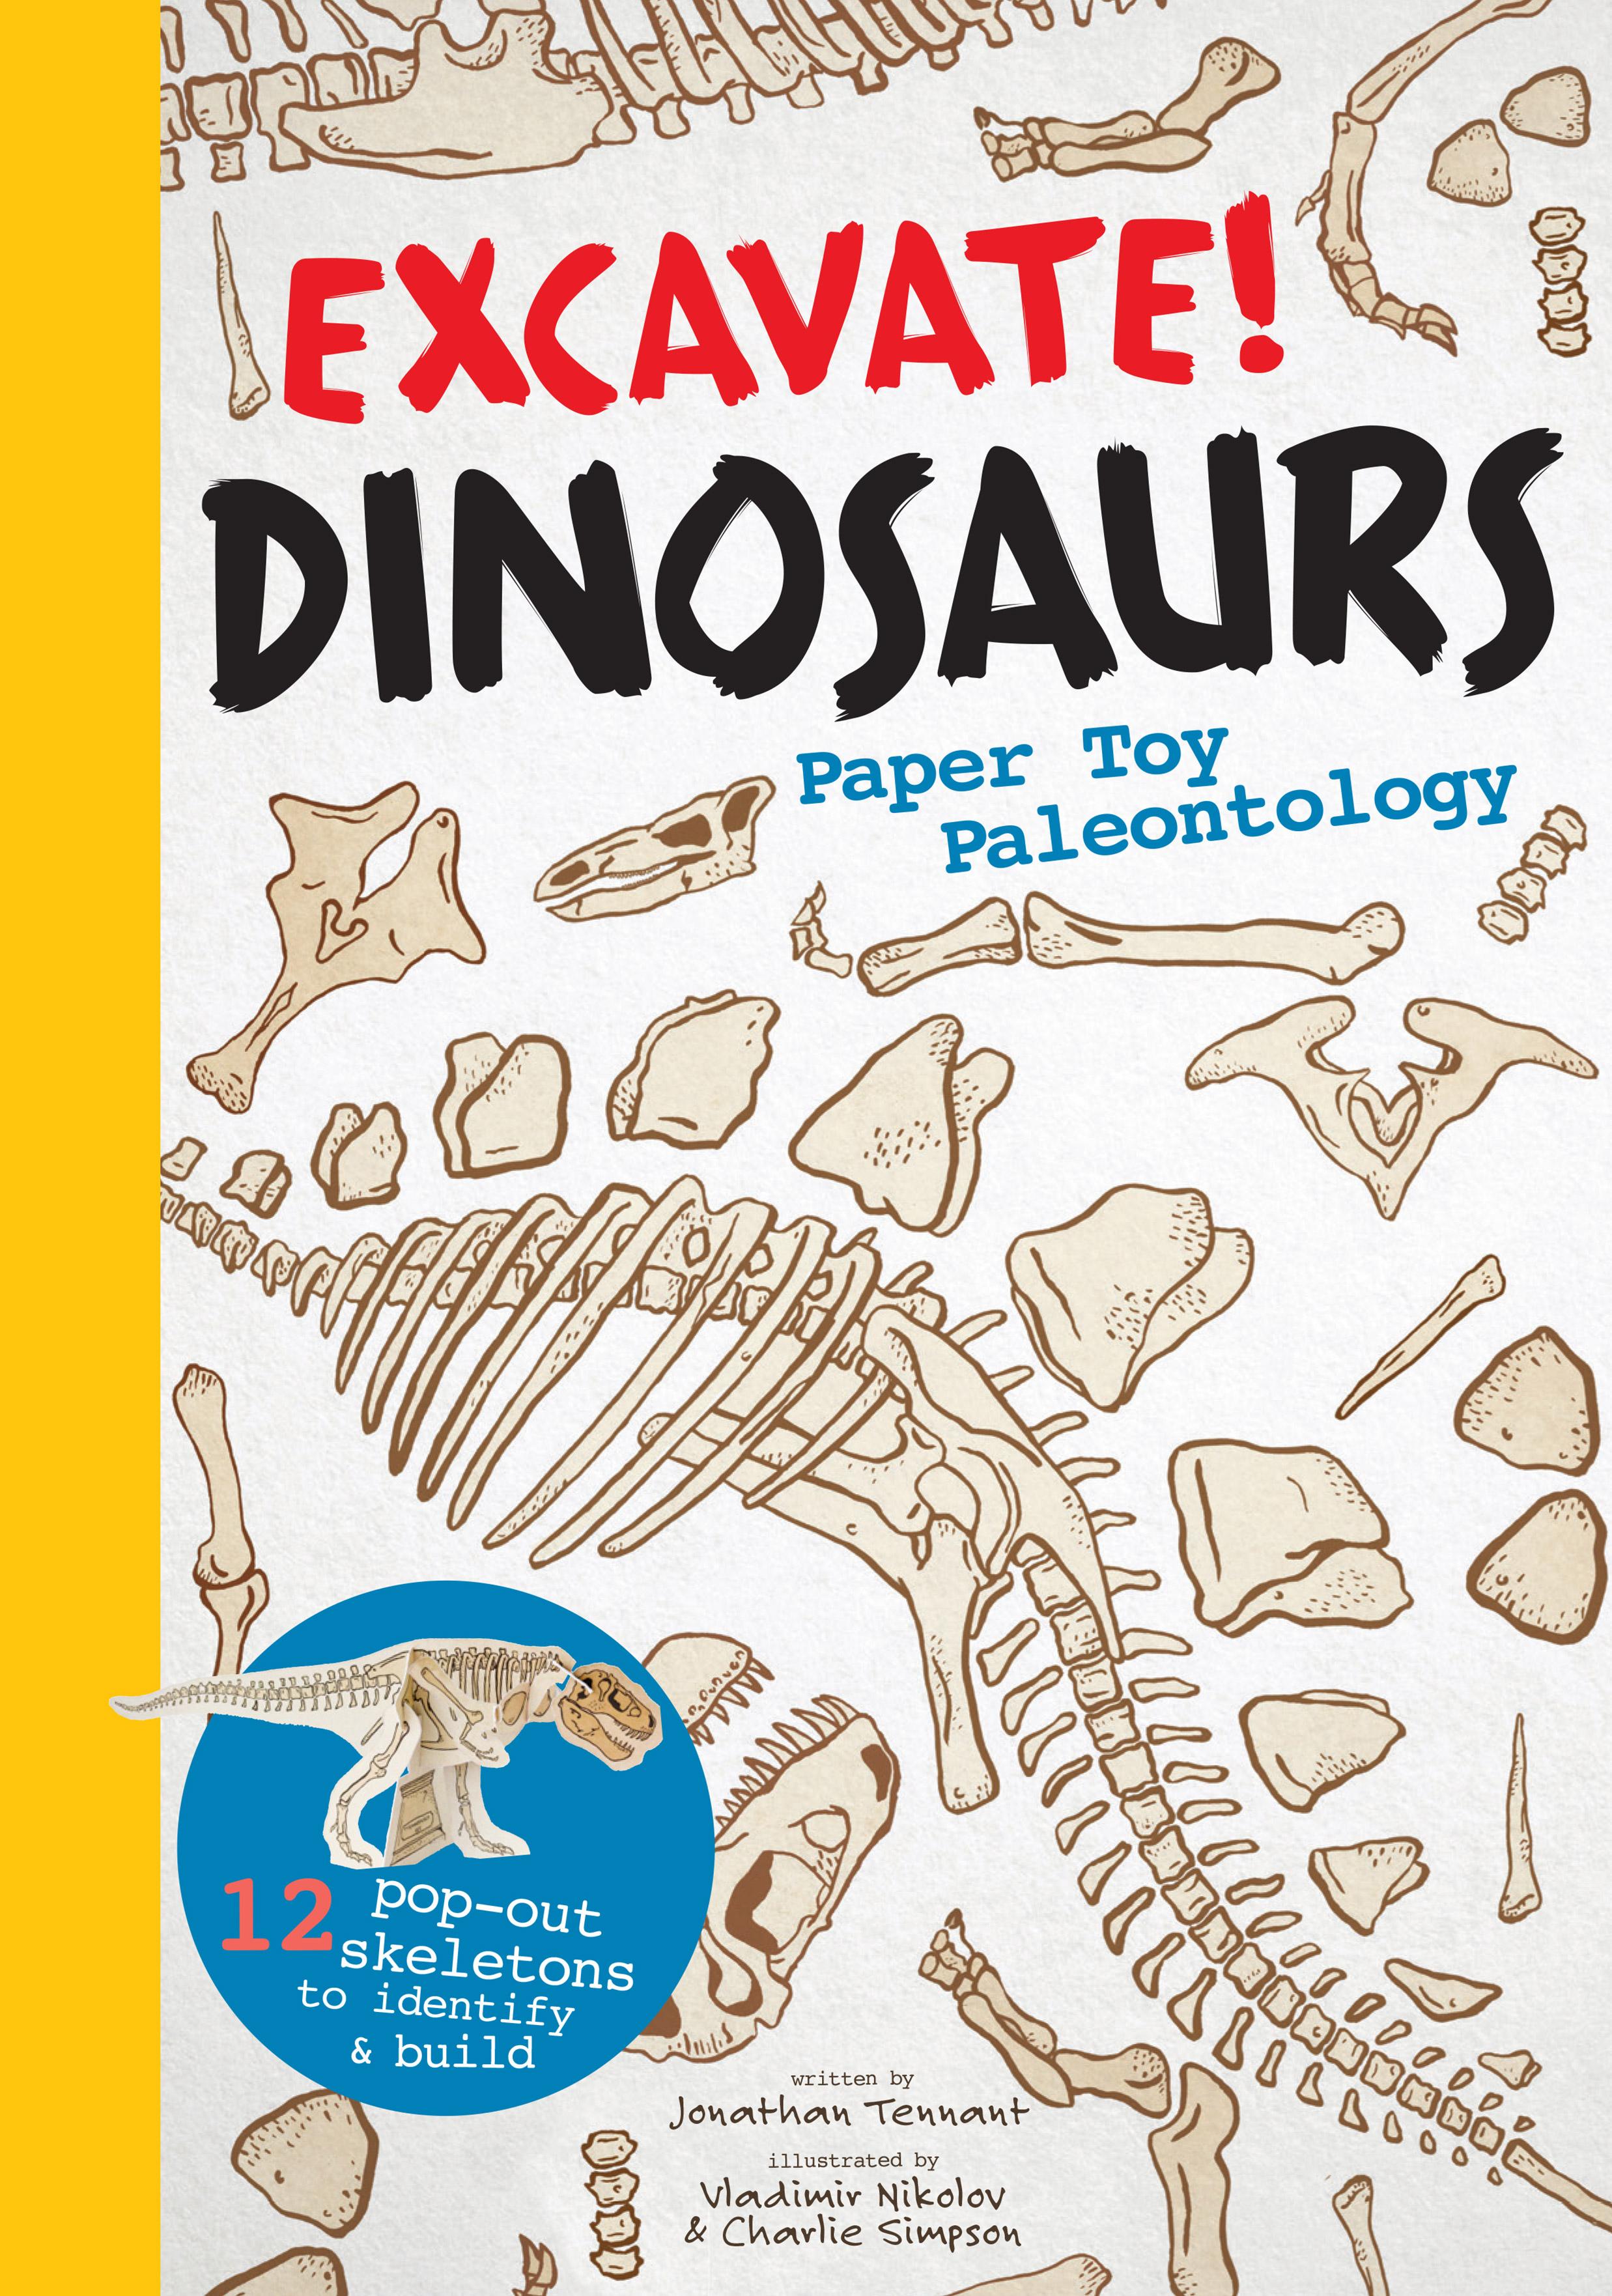 Excavate! Dinosaurs Paper Toy Paleontology - Jonathan Tennant